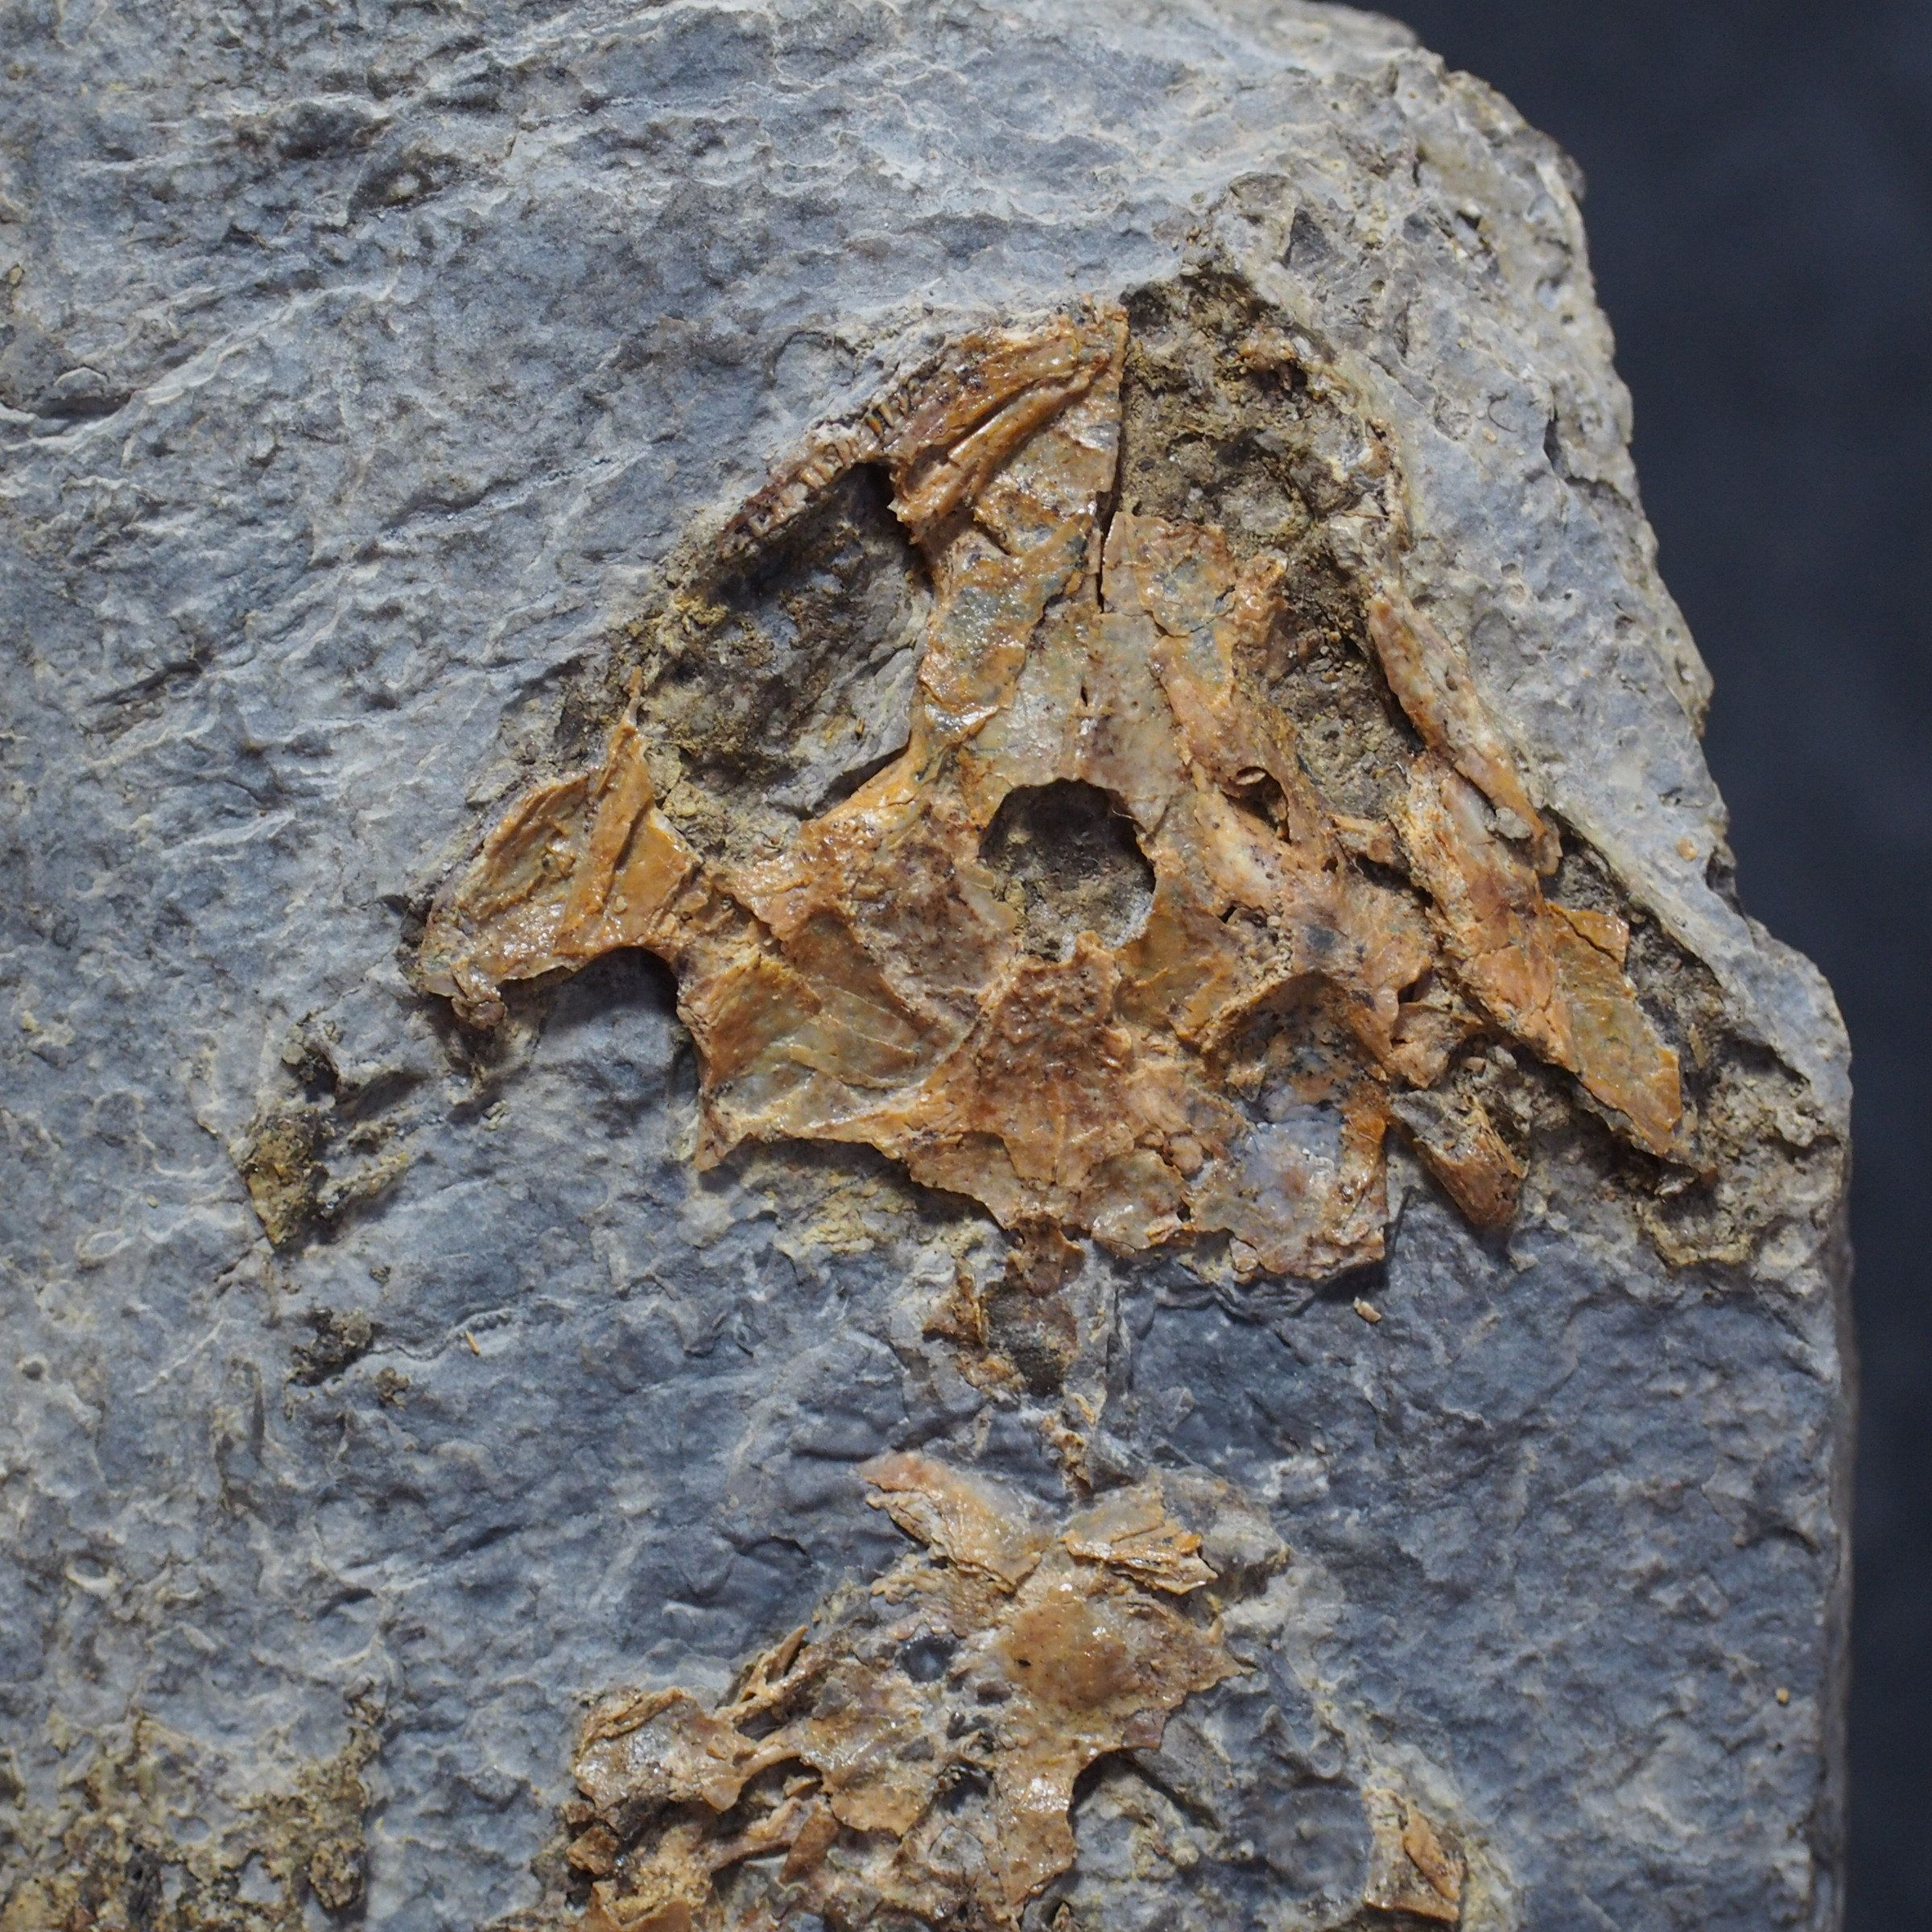 Czech Fossil Amphibian Discosauriscus Austriacus Permian